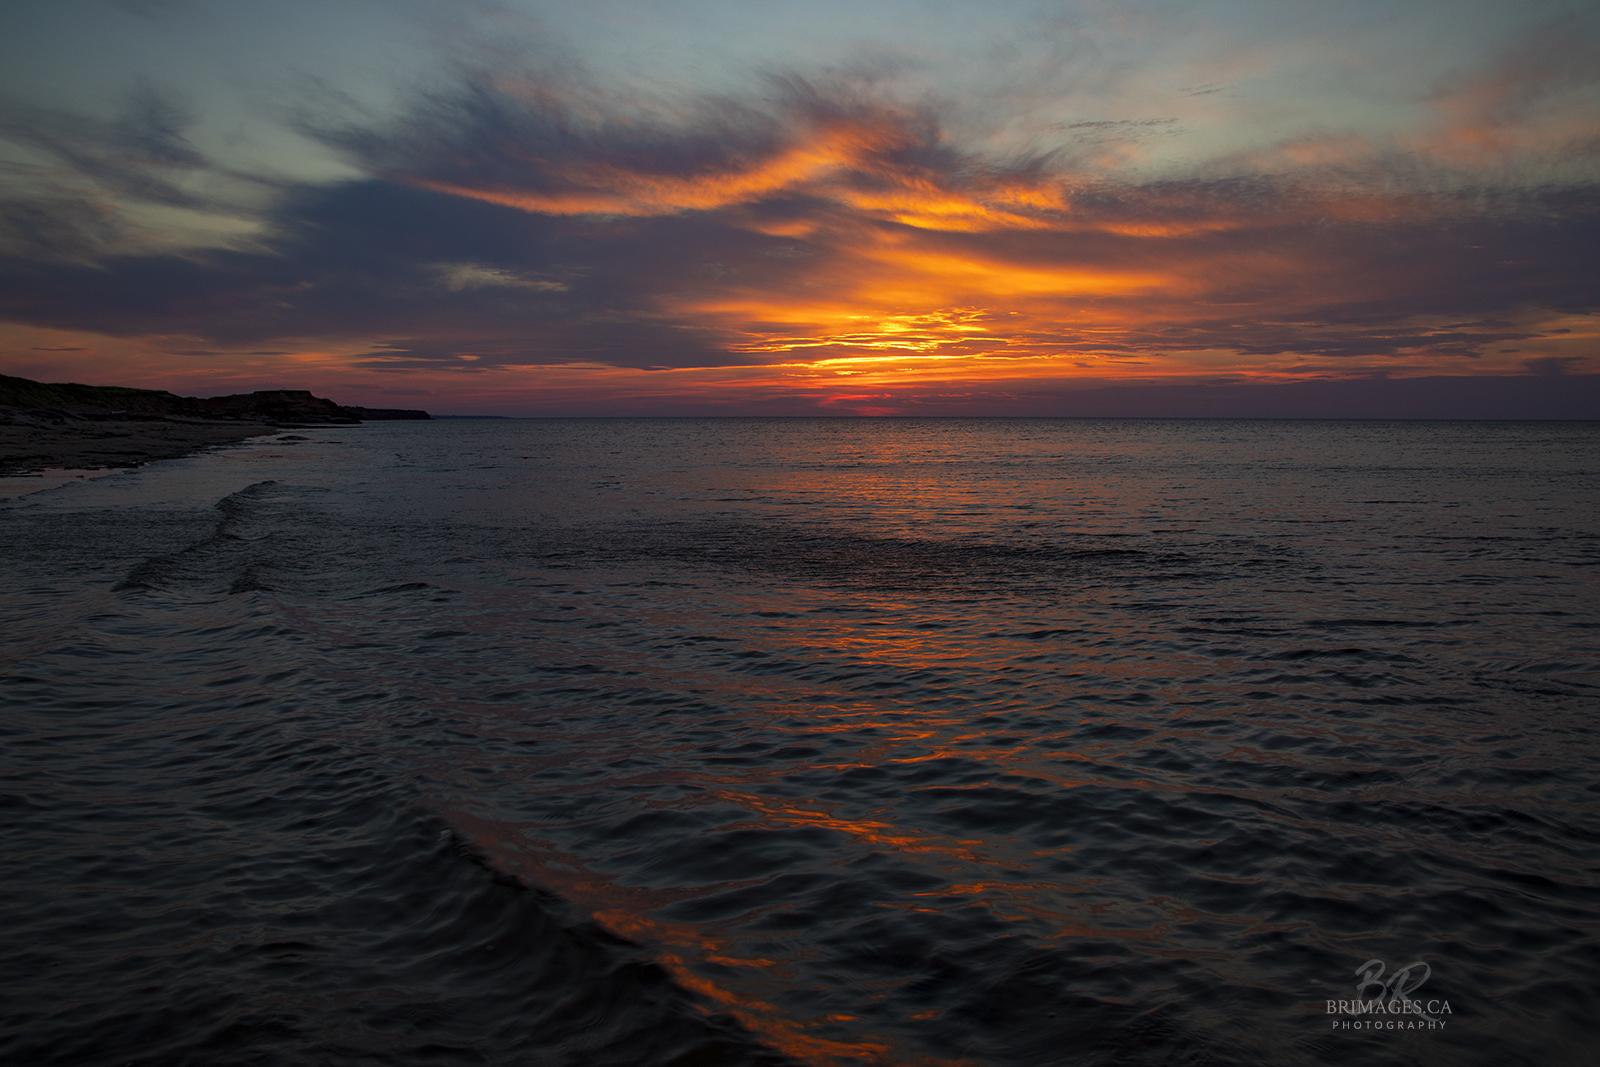 Sunset_PEI_water_BRimages.ca